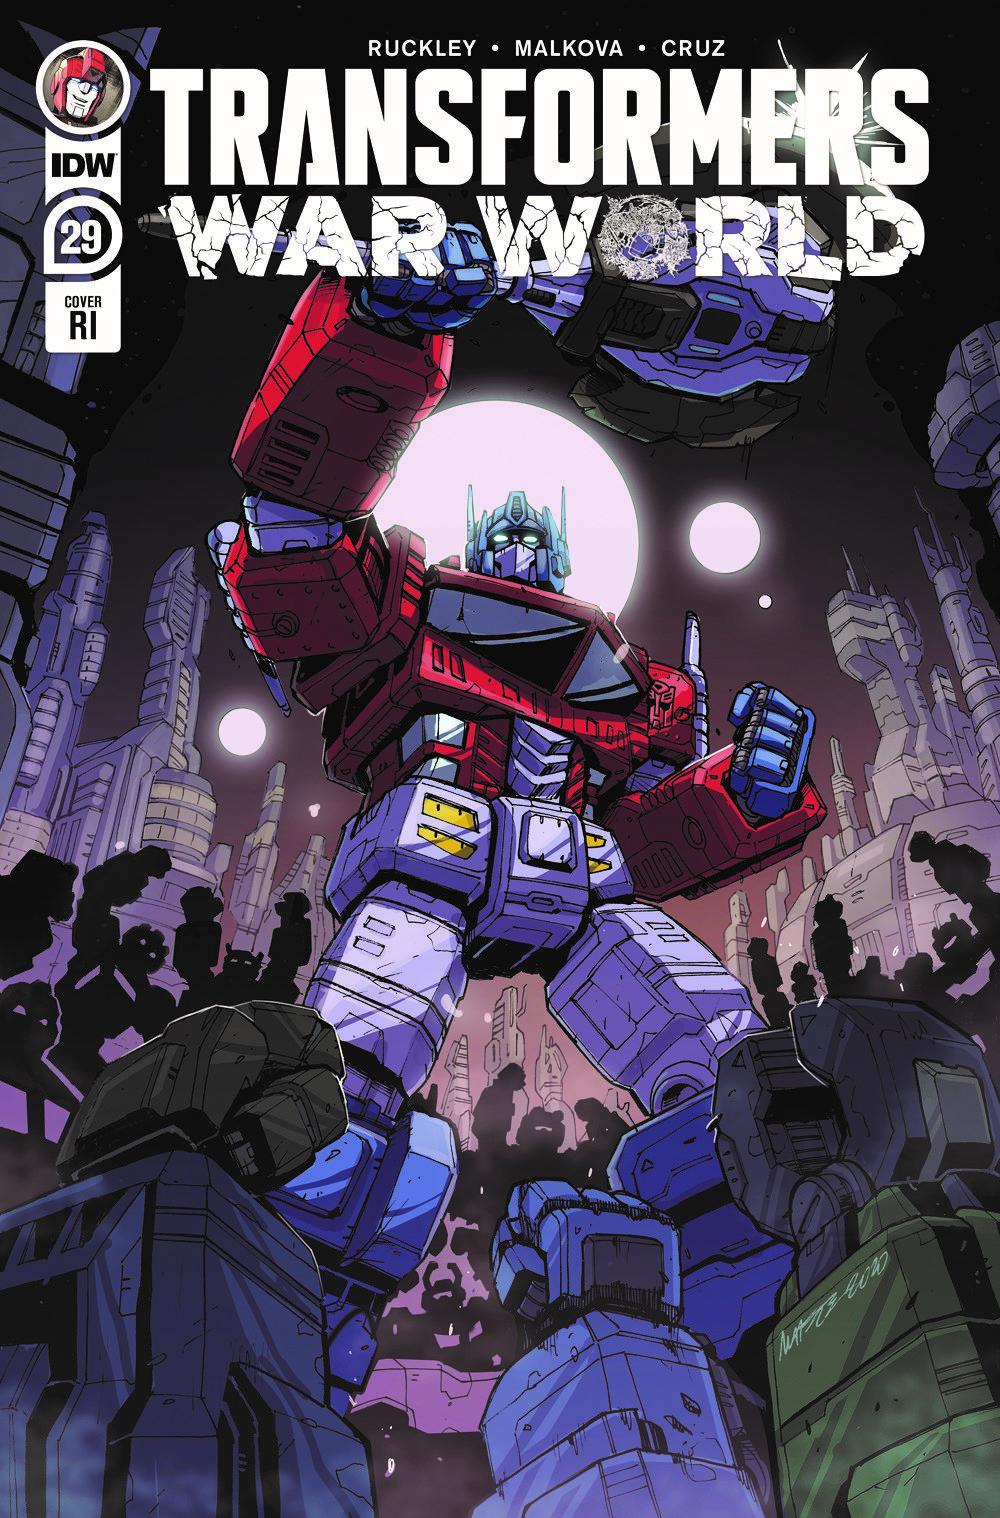 TF29-cvr-RI-rev ComicList Previews: TRANSFORMERS #29